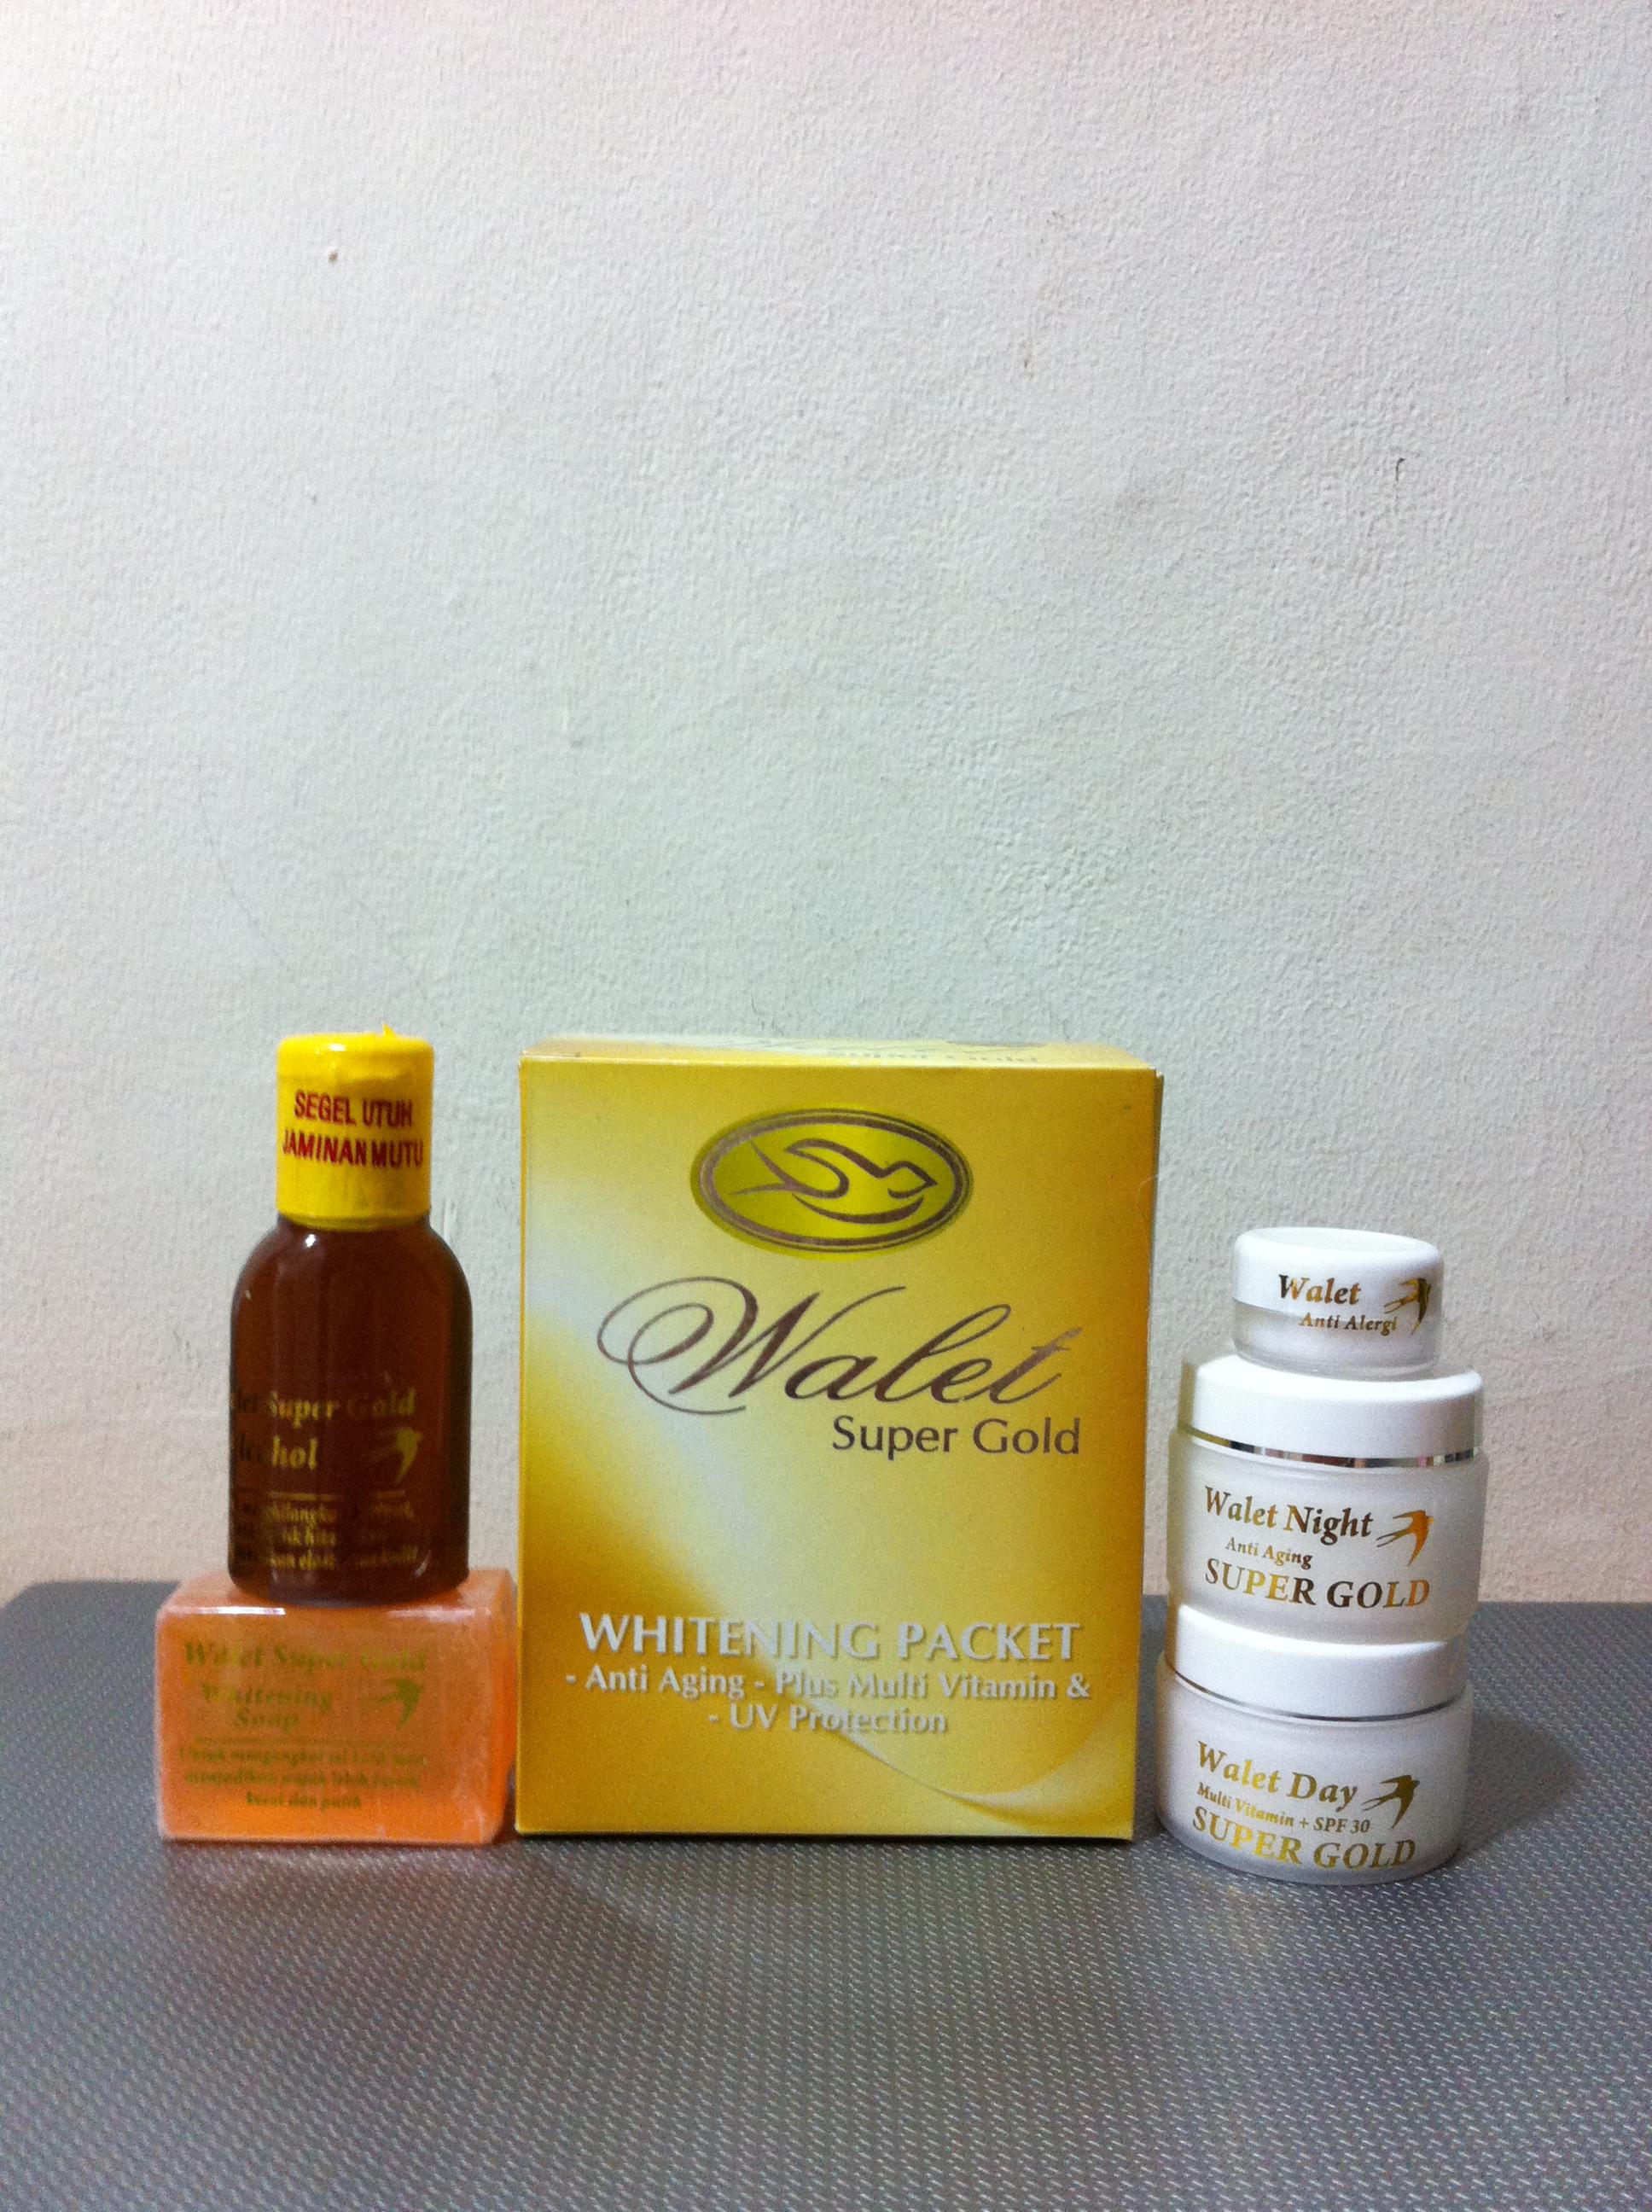 Jual Walet Super Gold Whitening Packet Liemoli Tokopedia Cream